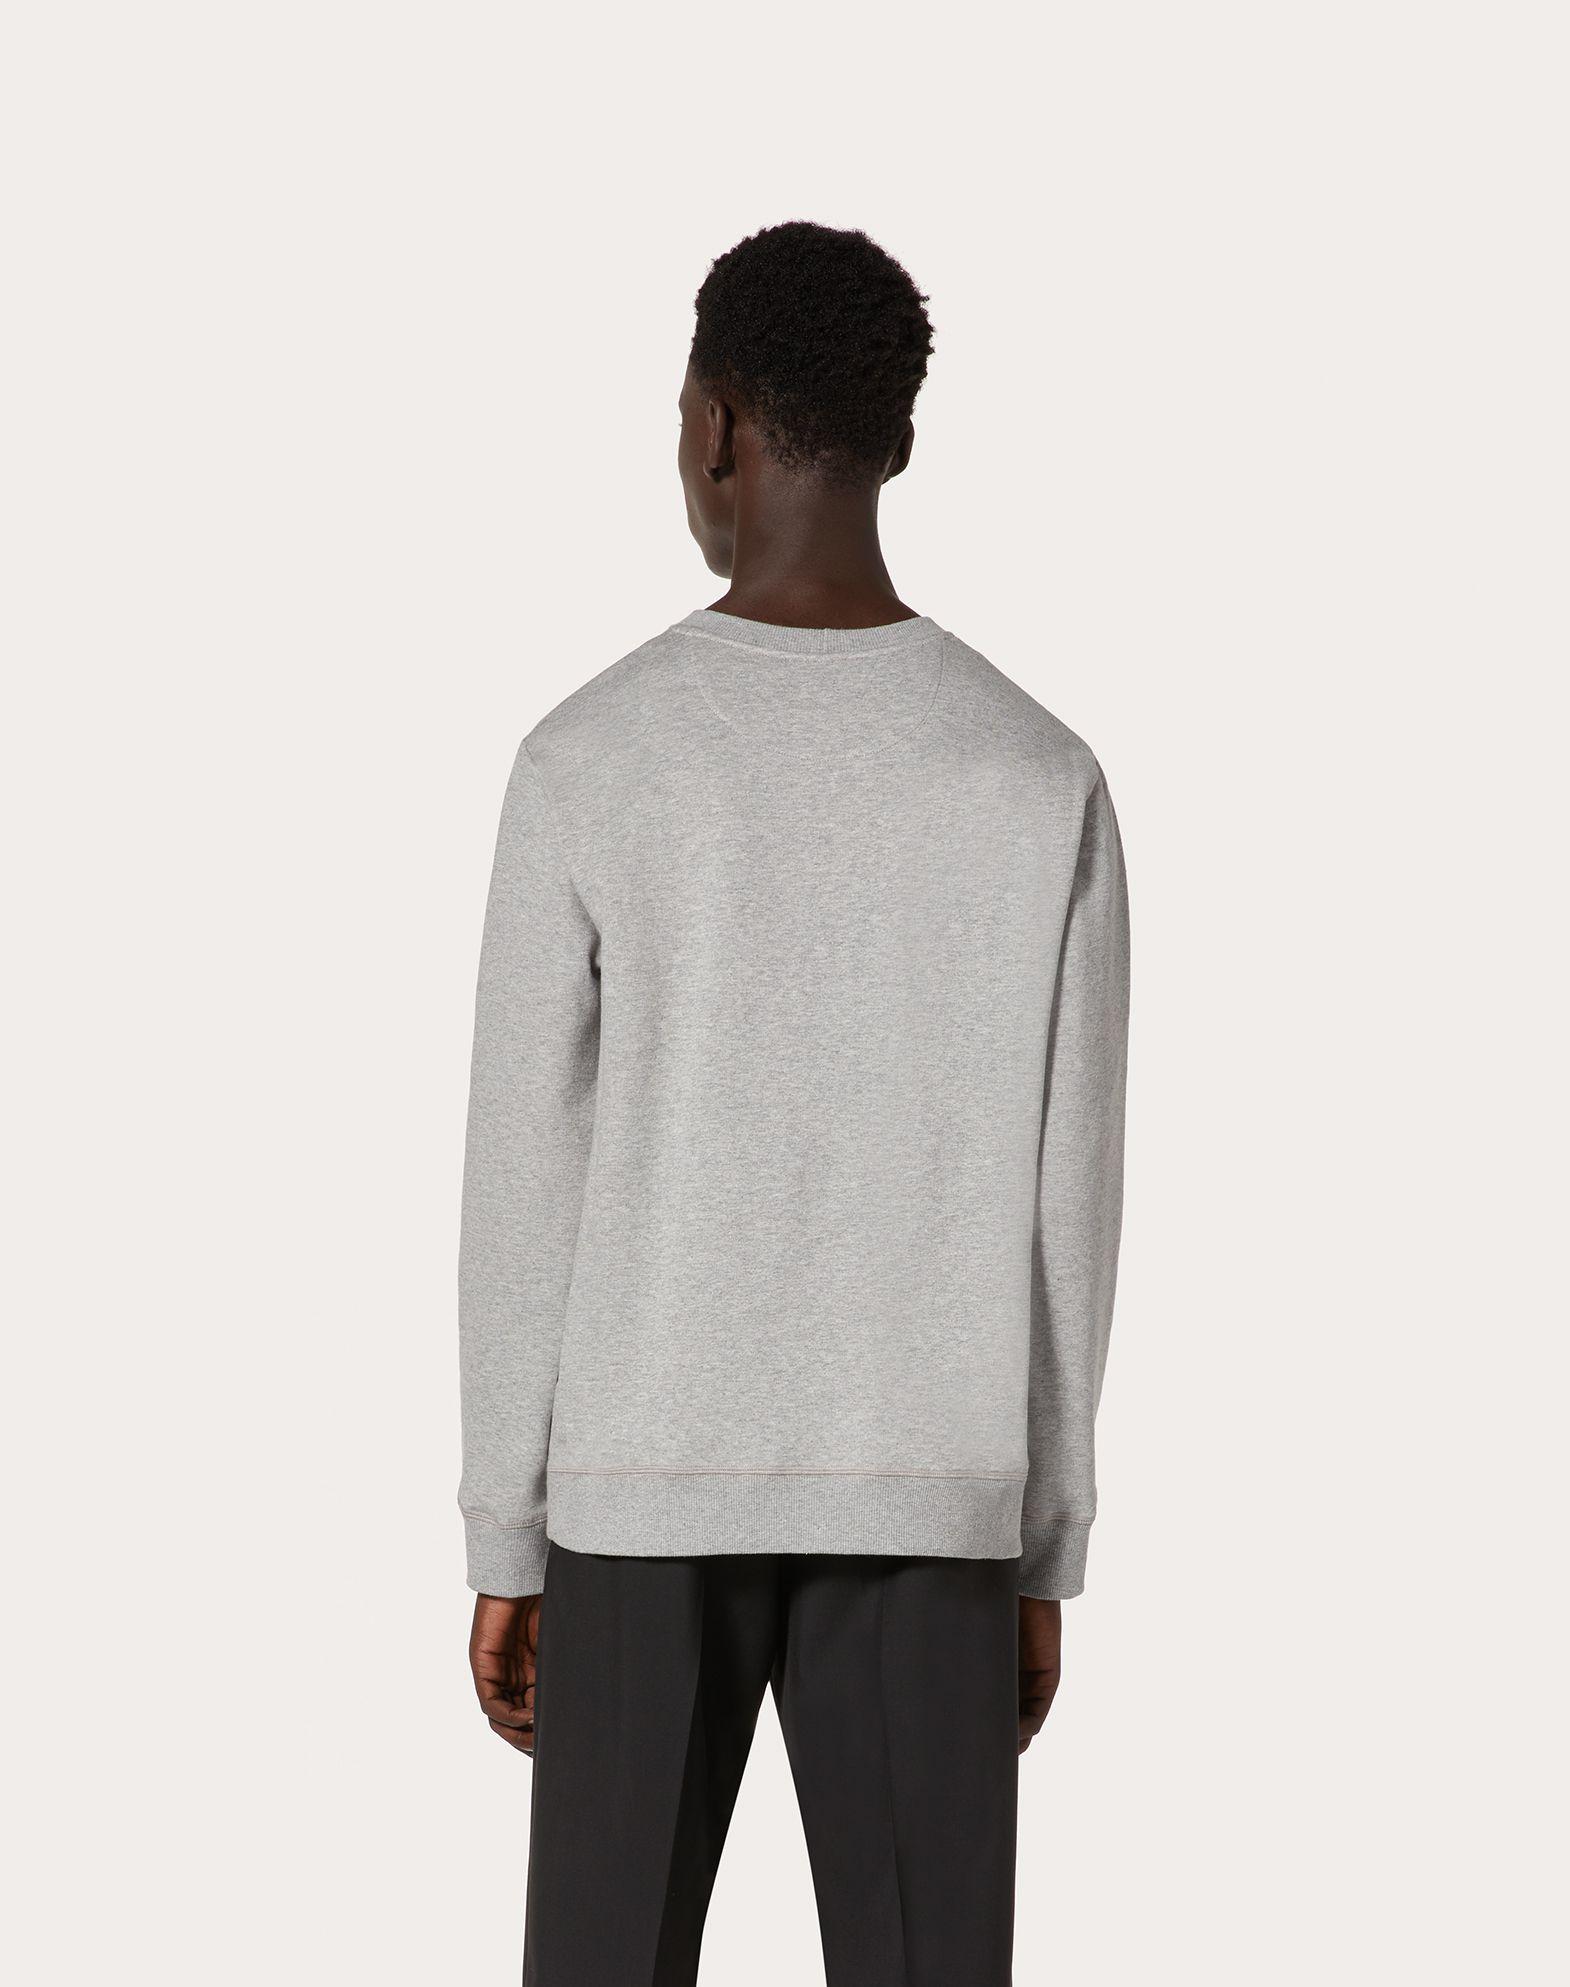 VALENTINO UOMO VLTN crew-neck sweatshirt Sweatshirt U e